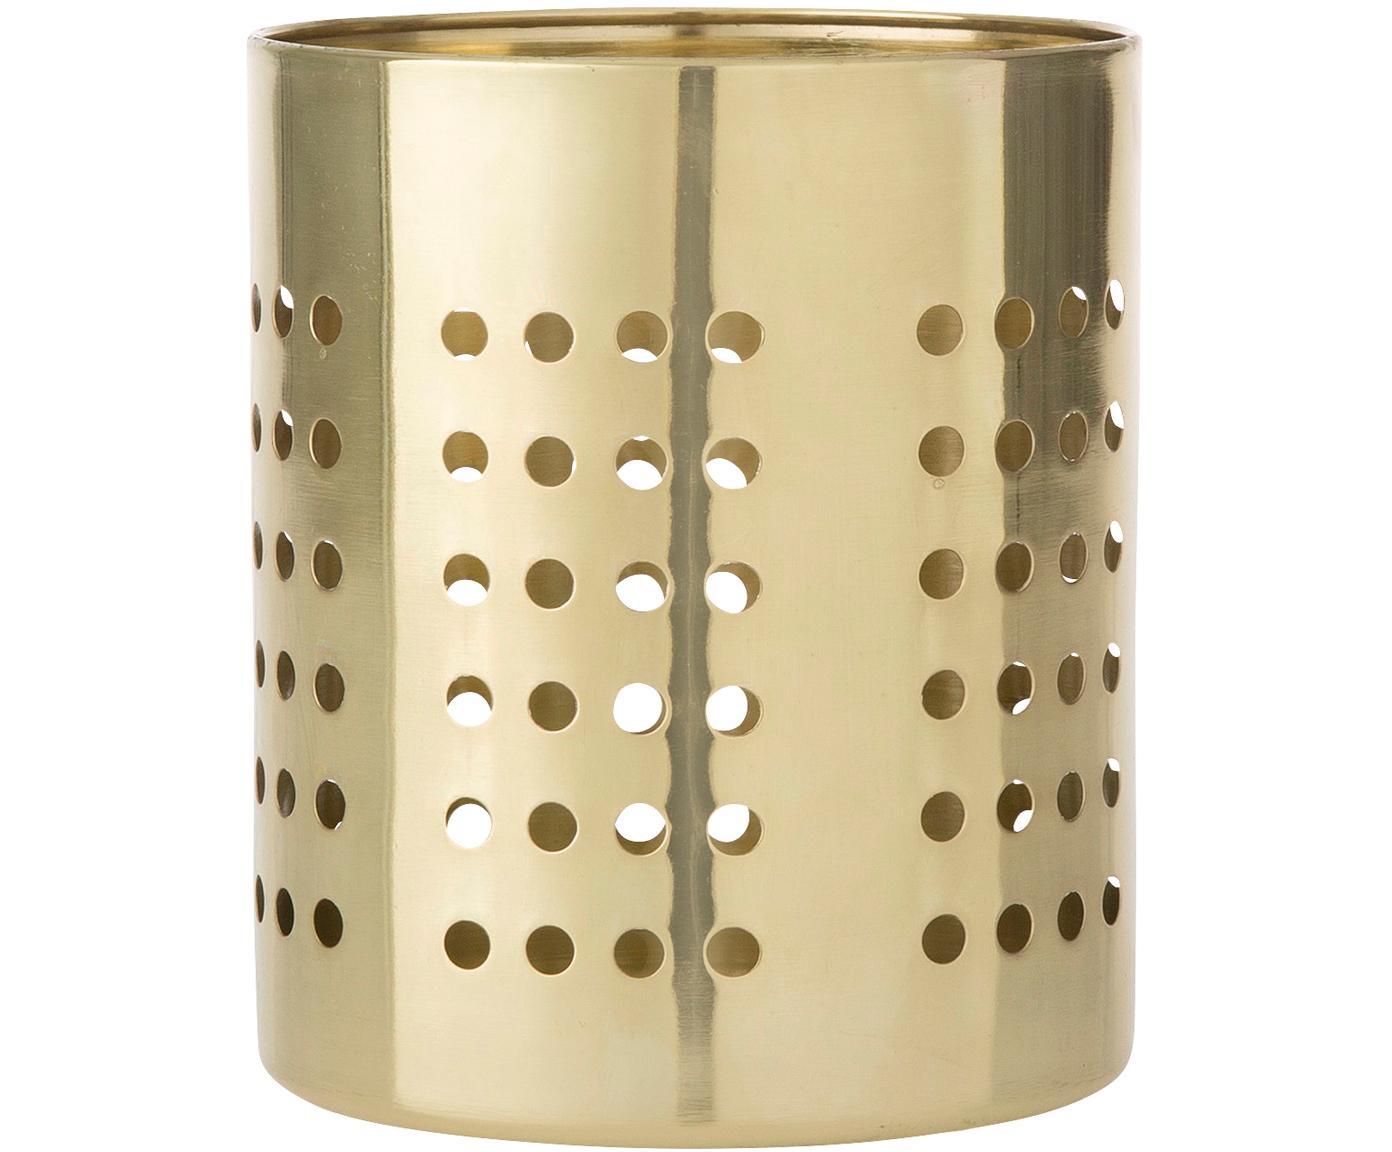 Porta utensilios Juno, Acero inoxidable, Latón, Ø 11 x Al 14 cm